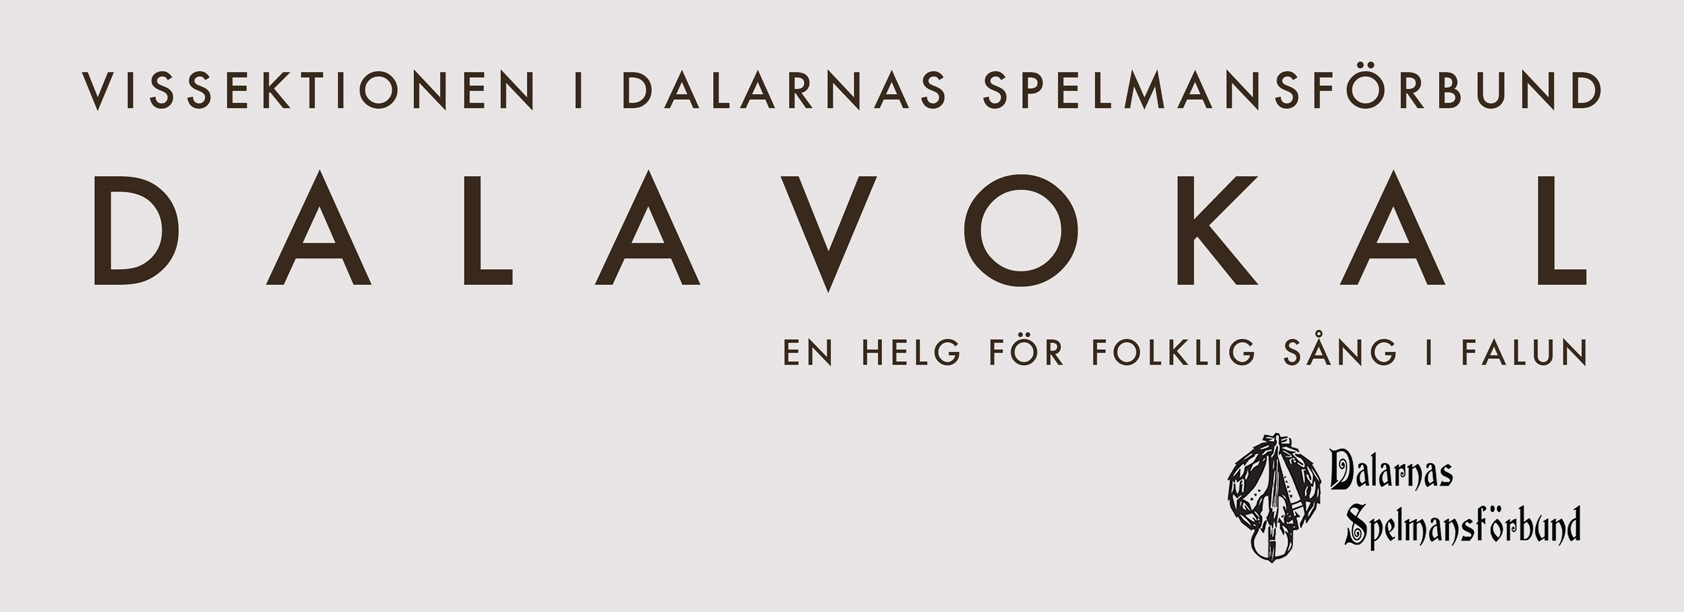 DalaVokal_header.jpg